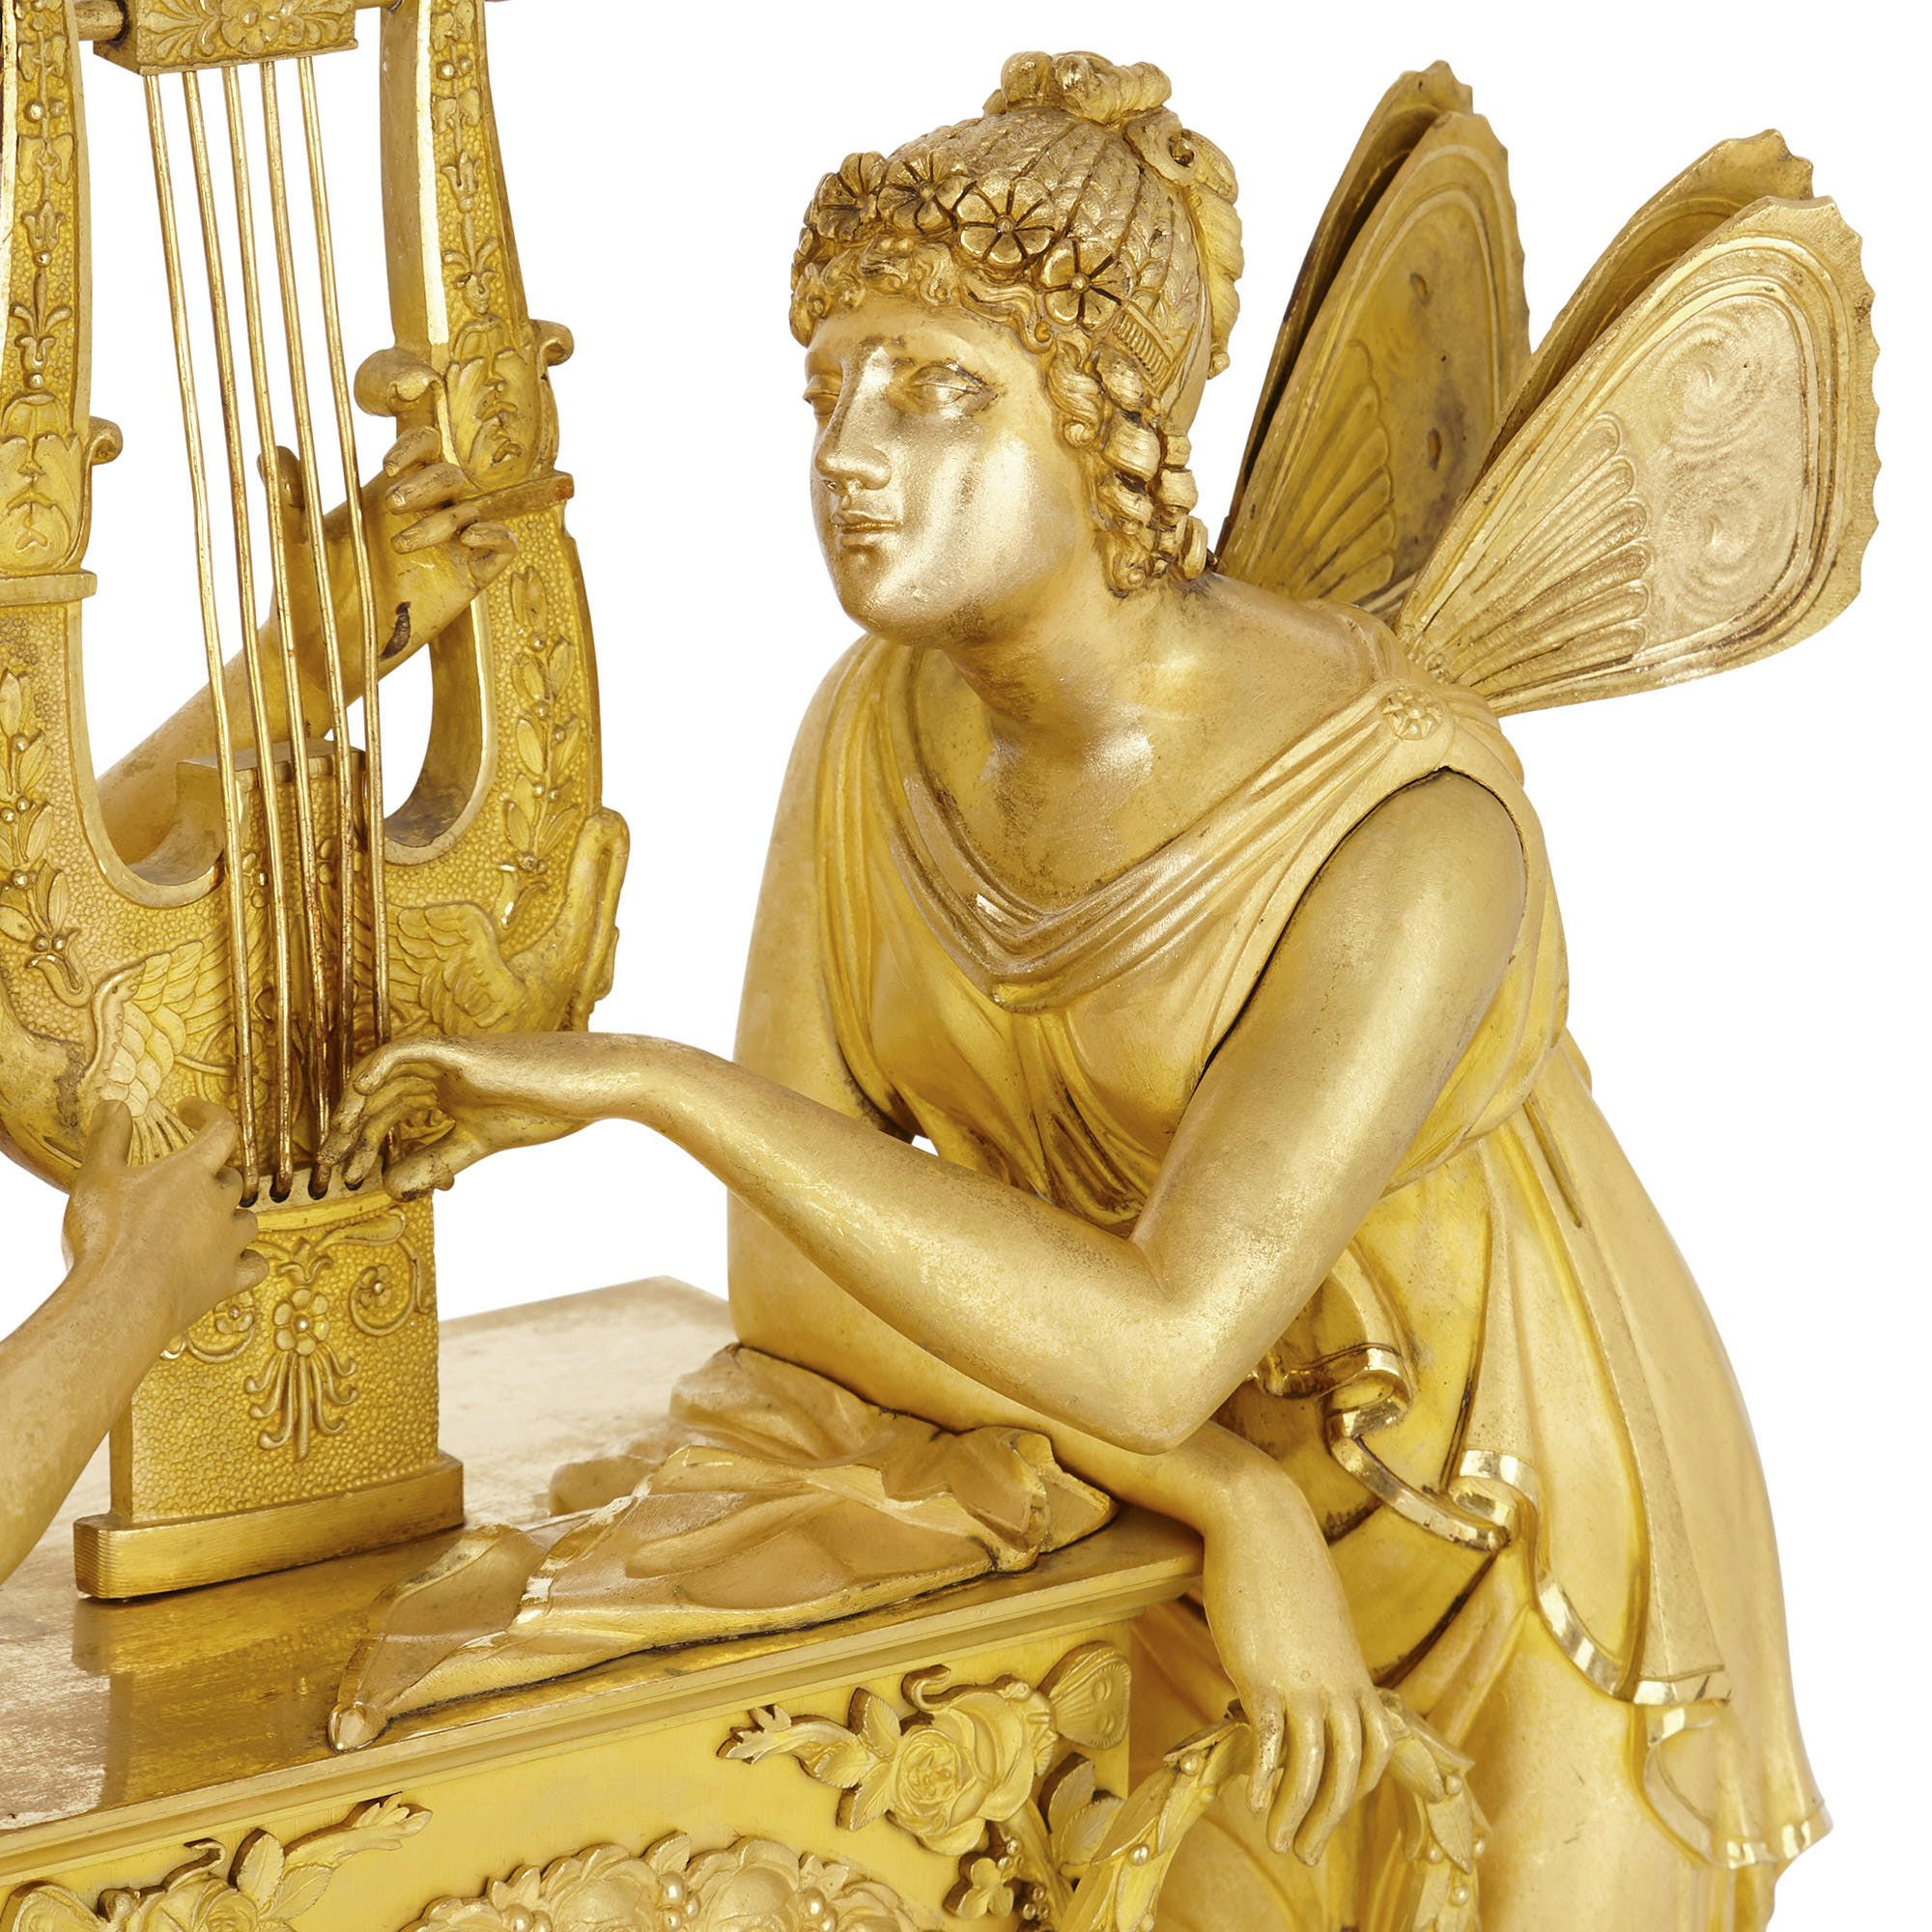 French Empire Period Ormolu Mantel Clock By Le Roy Et Fils